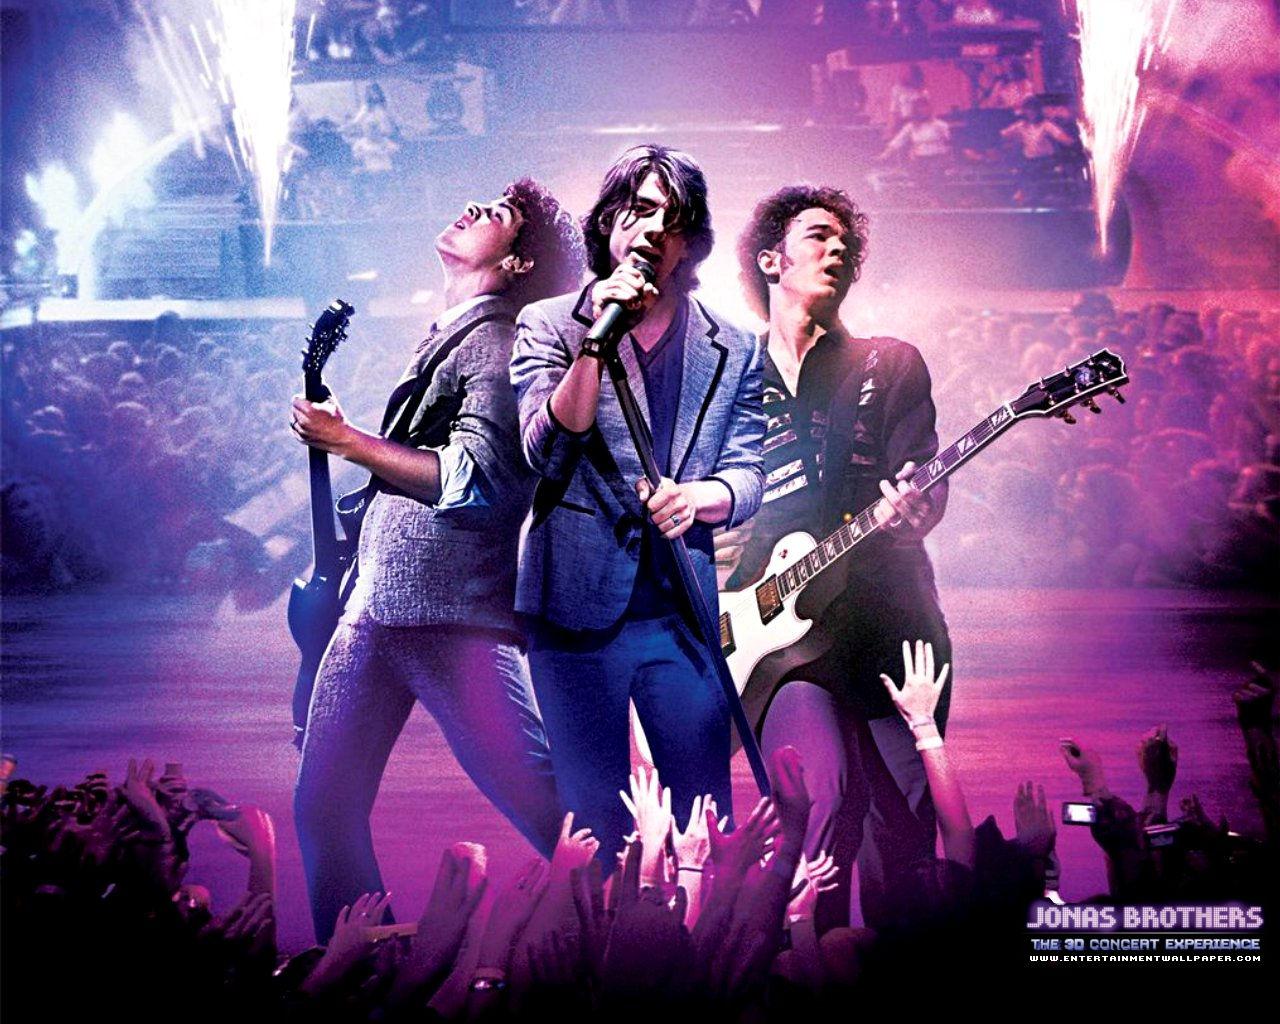 http://3.bp.blogspot.com/-g95-vqrfxmc/T02STpZTjOI/AAAAAAAANoQ/7y19dXTwmkU/s1600/Jonas%2BBrothers16.jpg